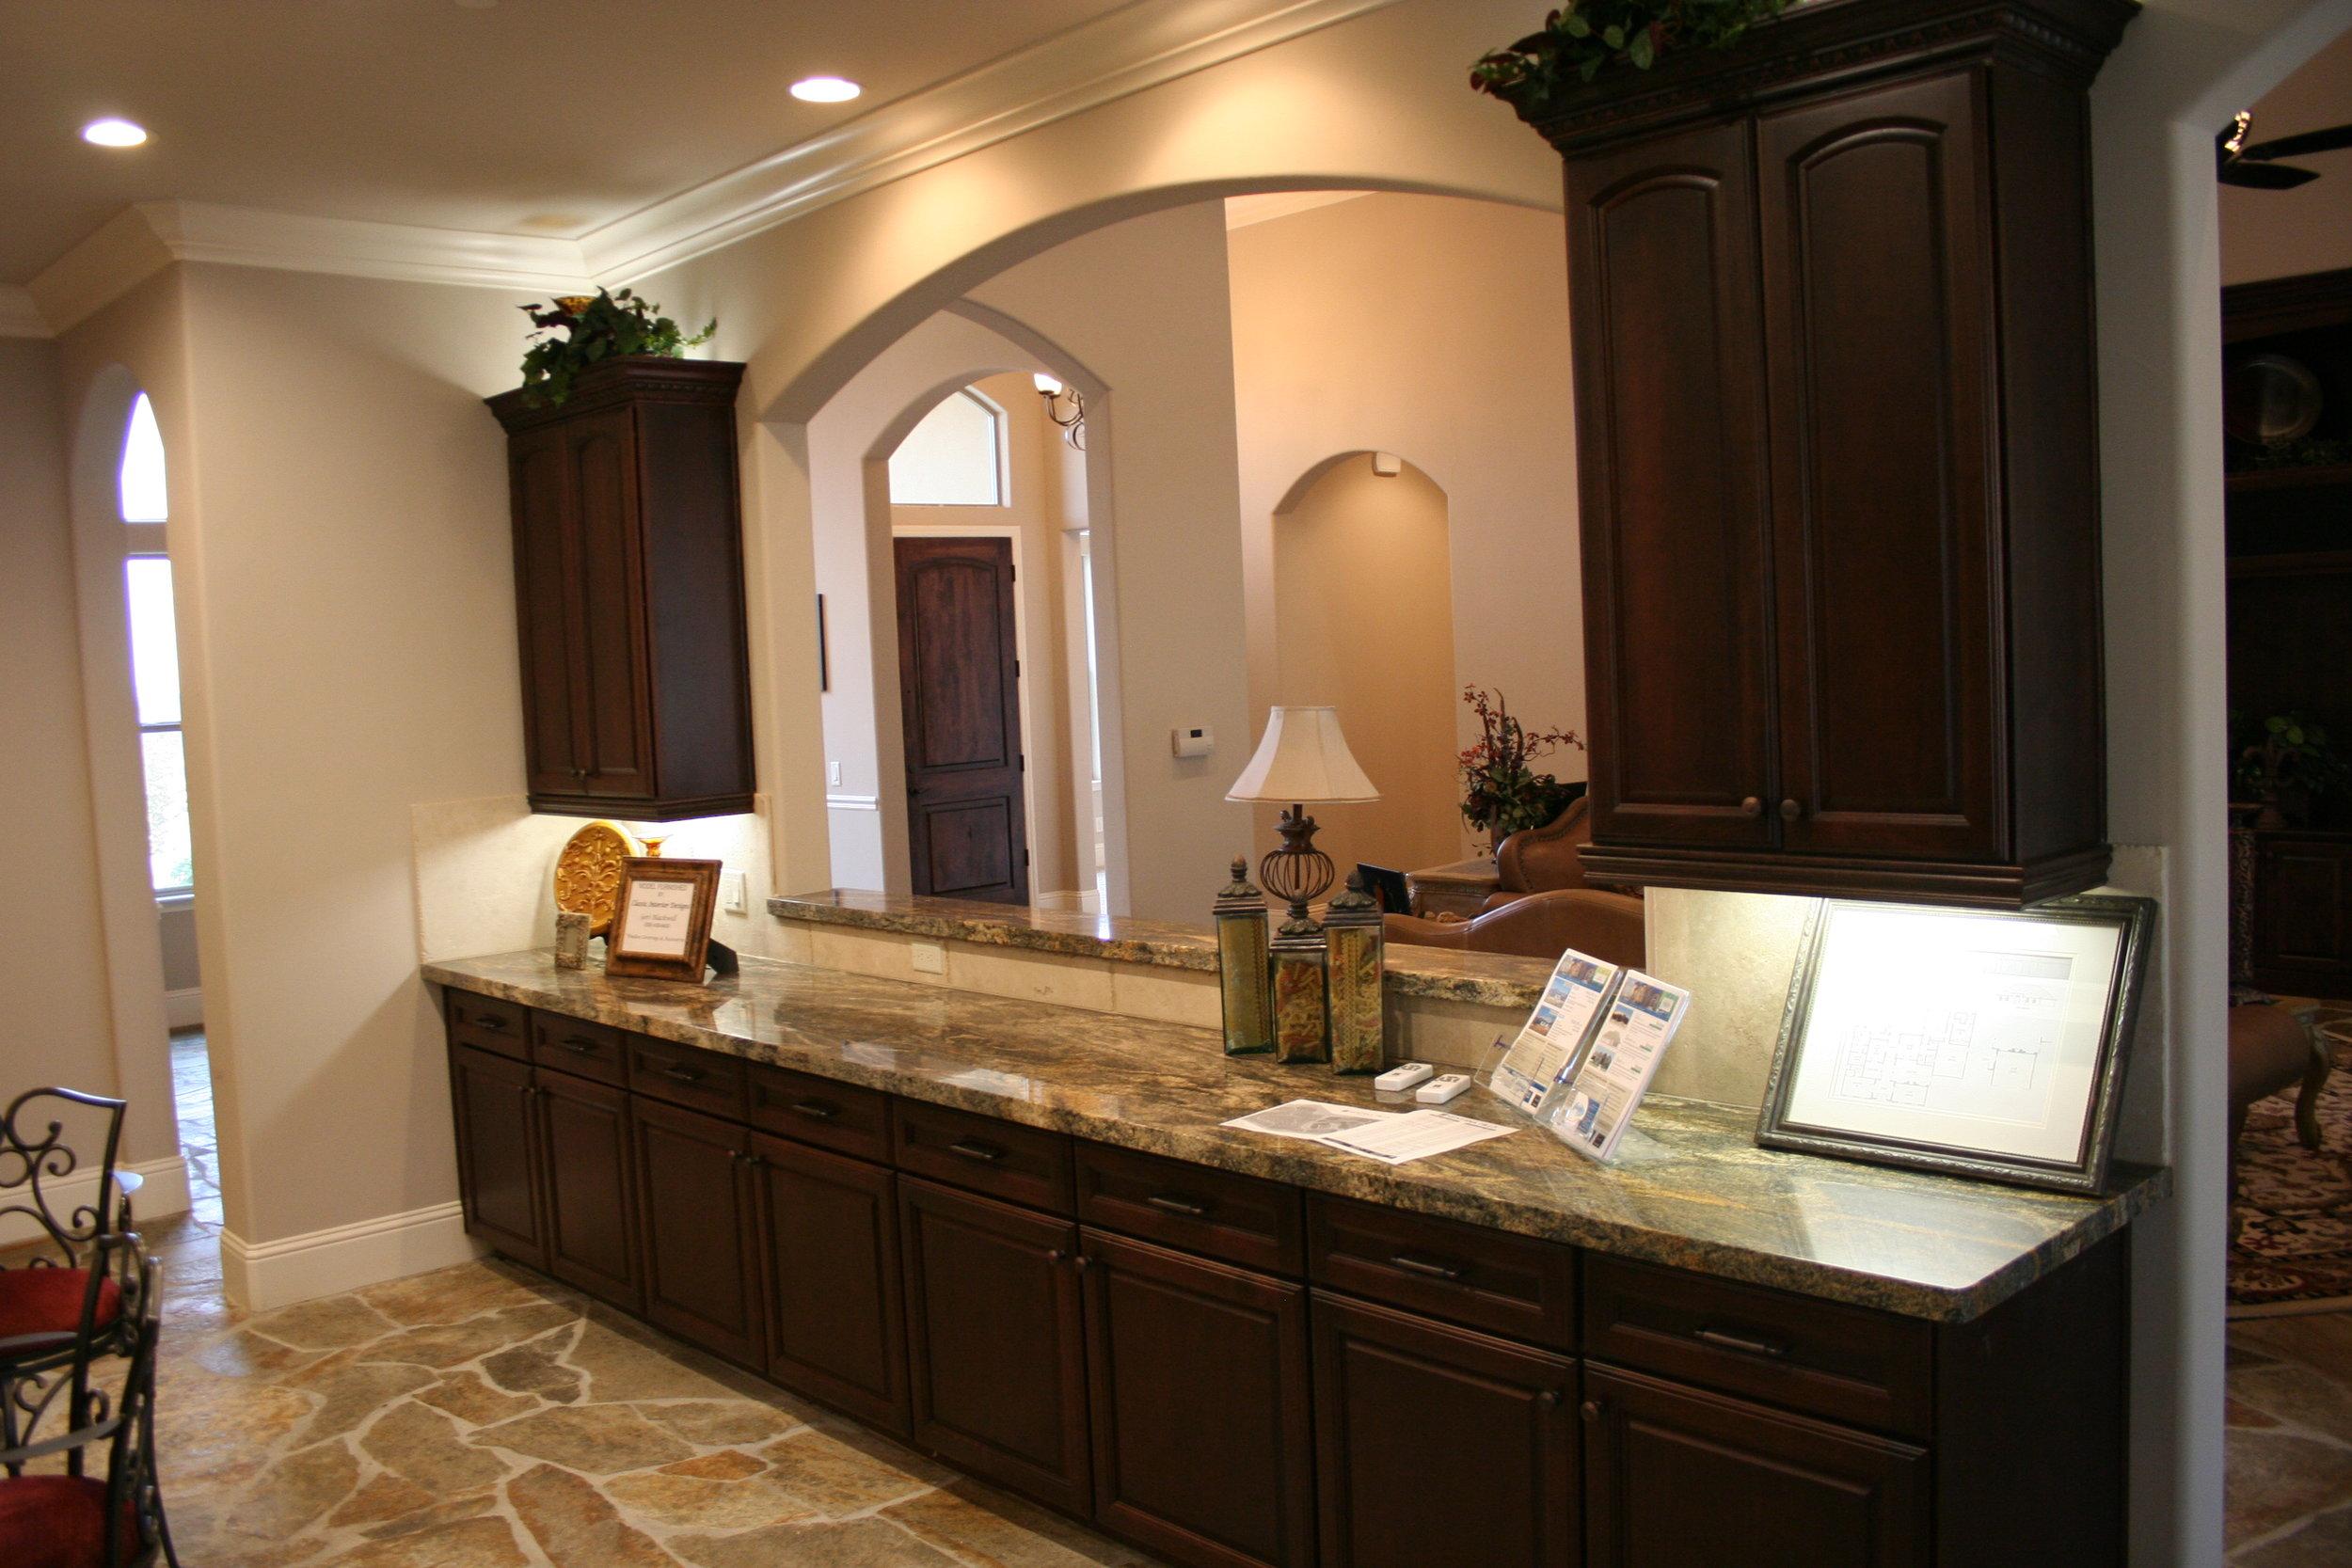 84-kitchen granite cabinets.JPG